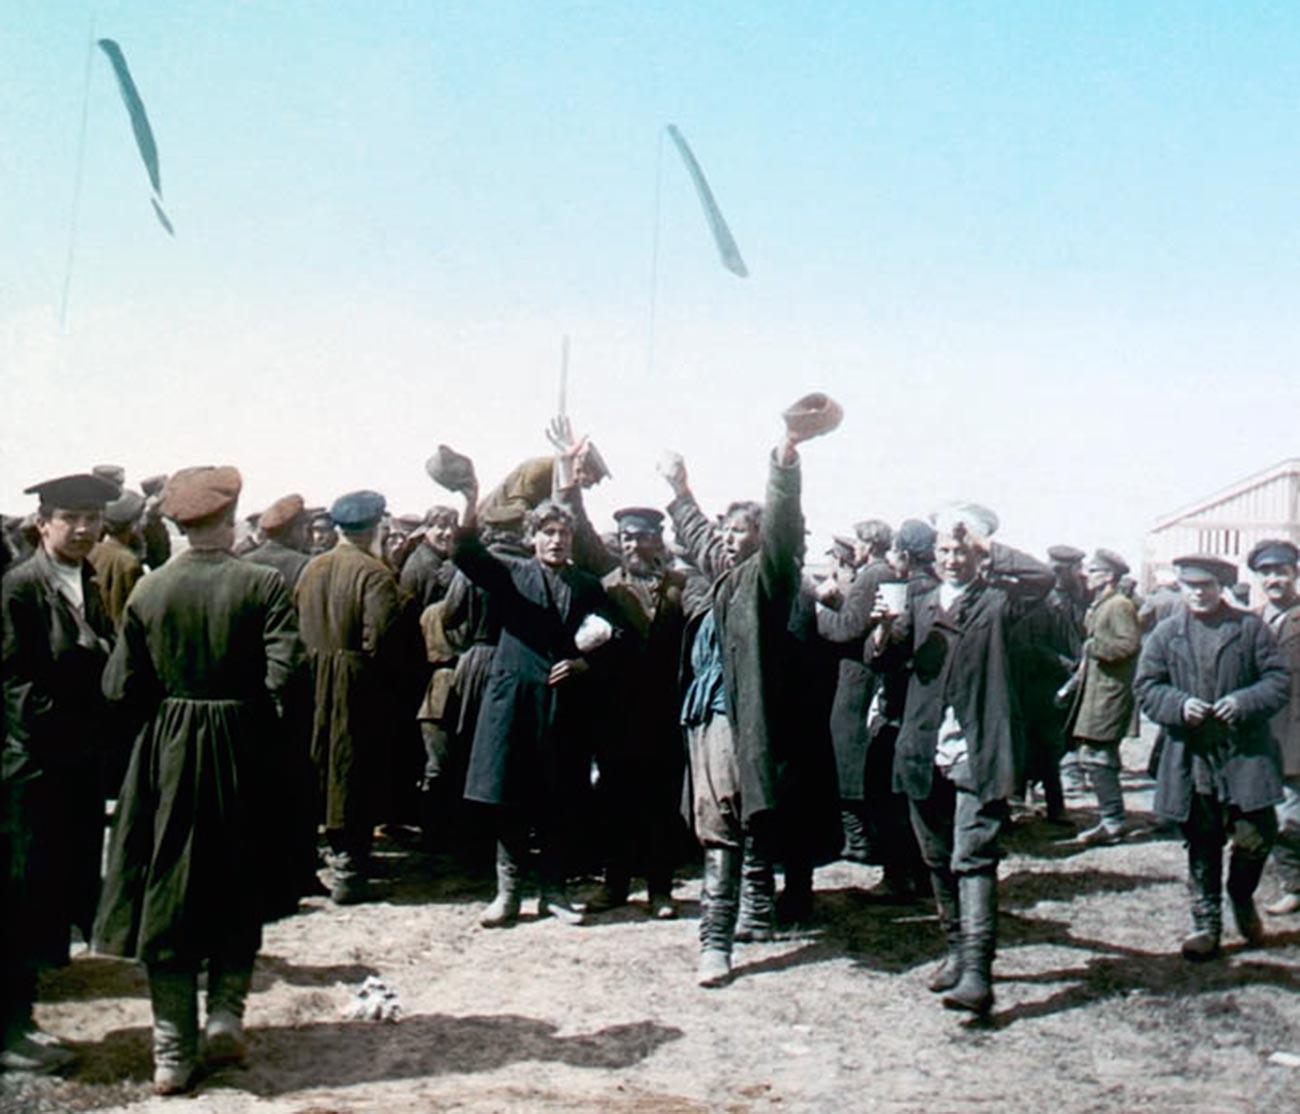 Zabava povodom krunidbe, 30. svibnja 1896.